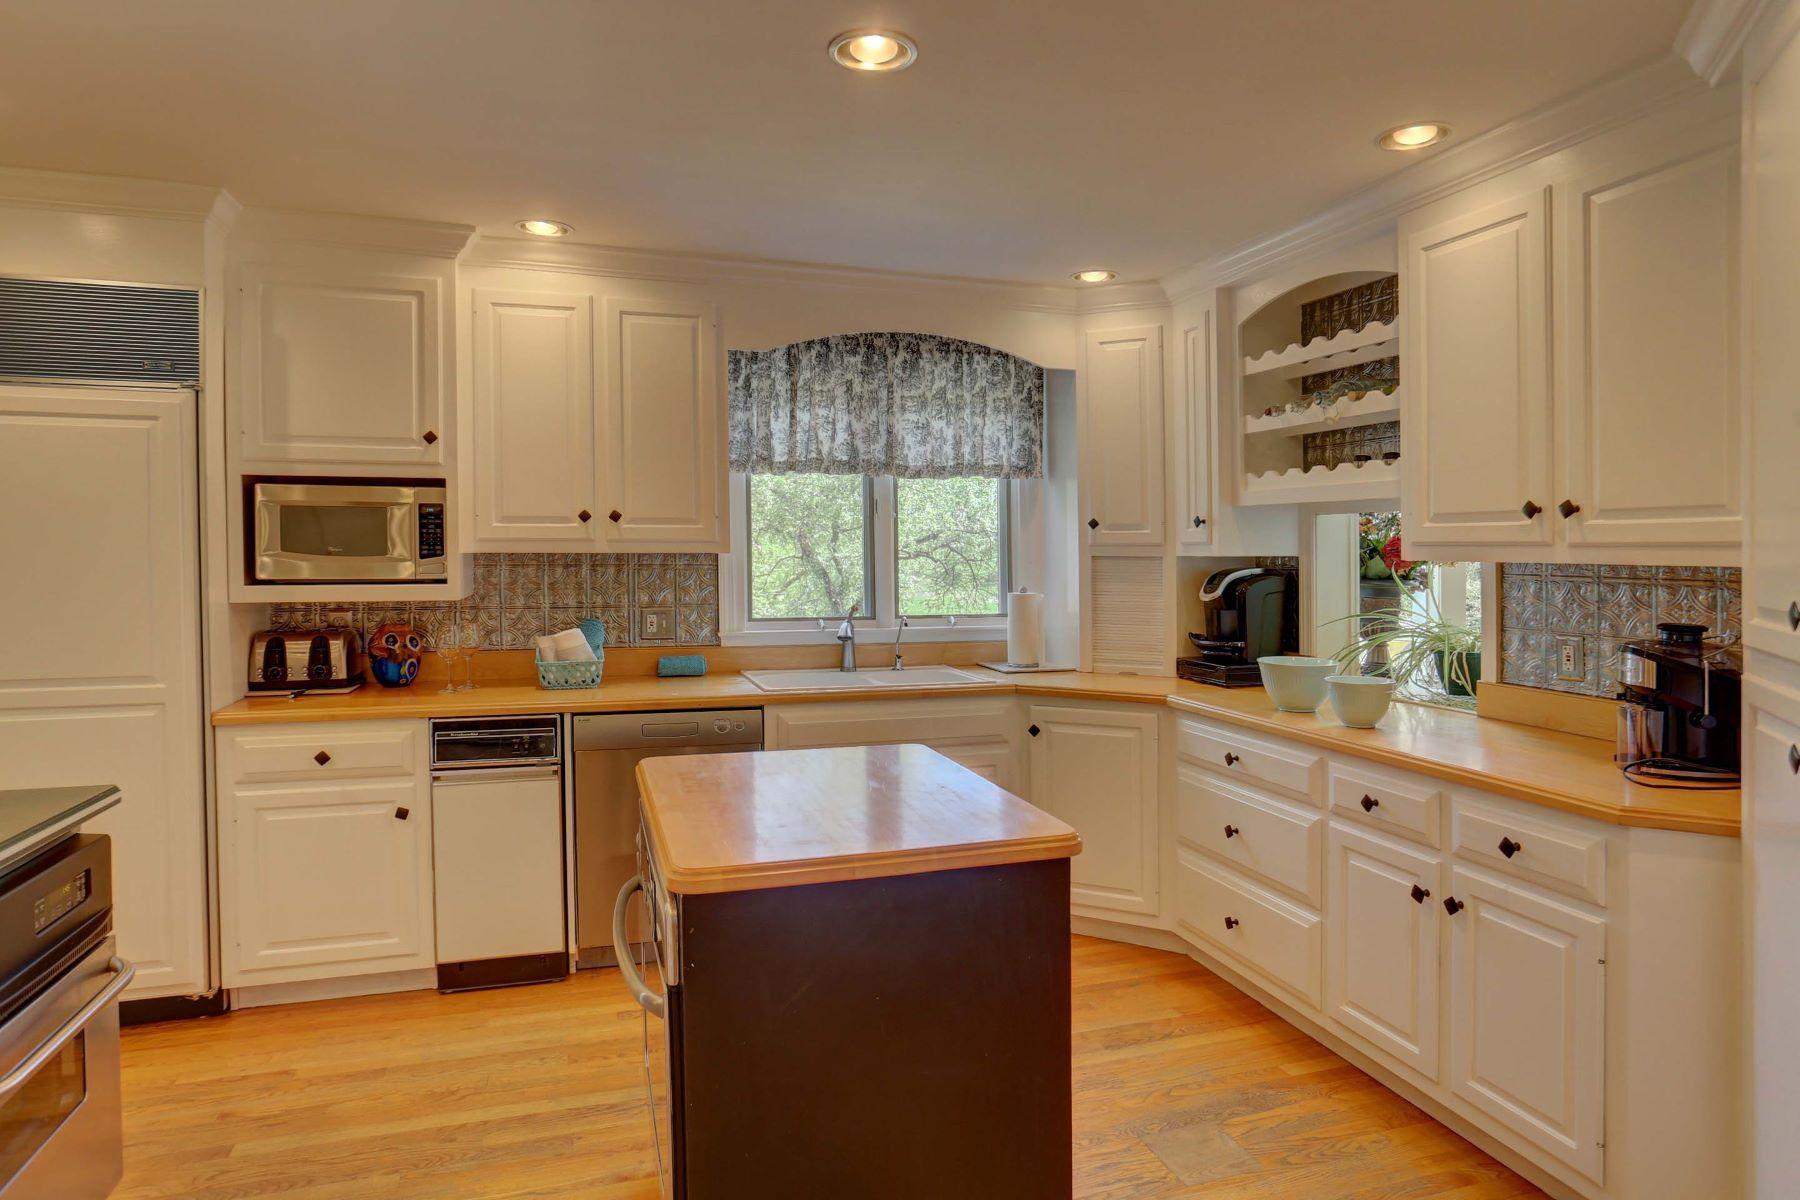 Additional photo for property listing at 663 Oakwood Lane 663 Oakwood Lane 兰开斯特, 宾夕法尼亚州 17603 美国